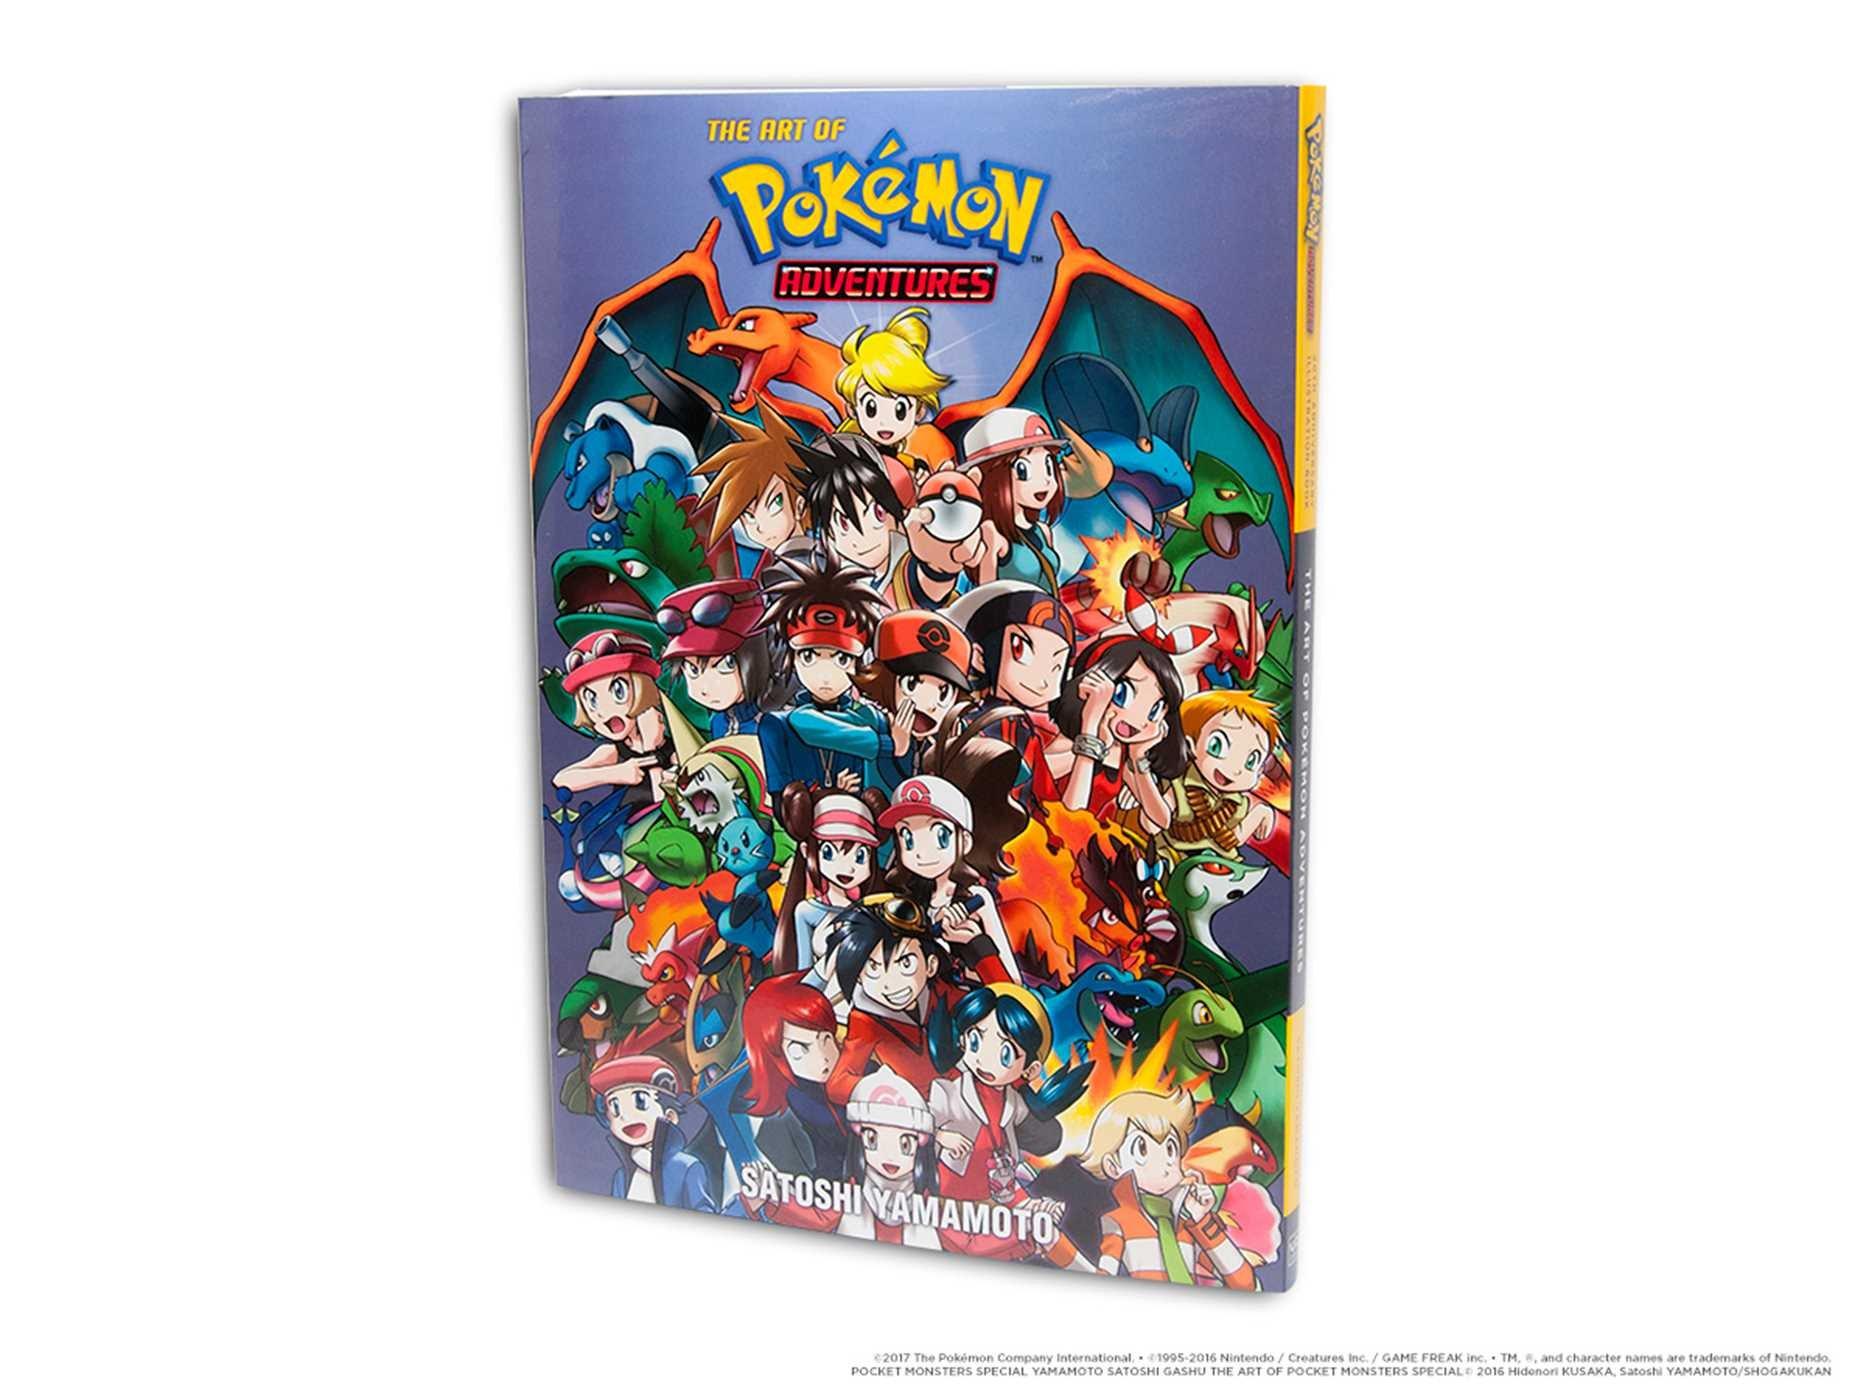 Pokémon Adventures 20th Anniversary Illustration Book: The Art of Pokémon Adventures (Pokemon) by VIZ (Image #3)